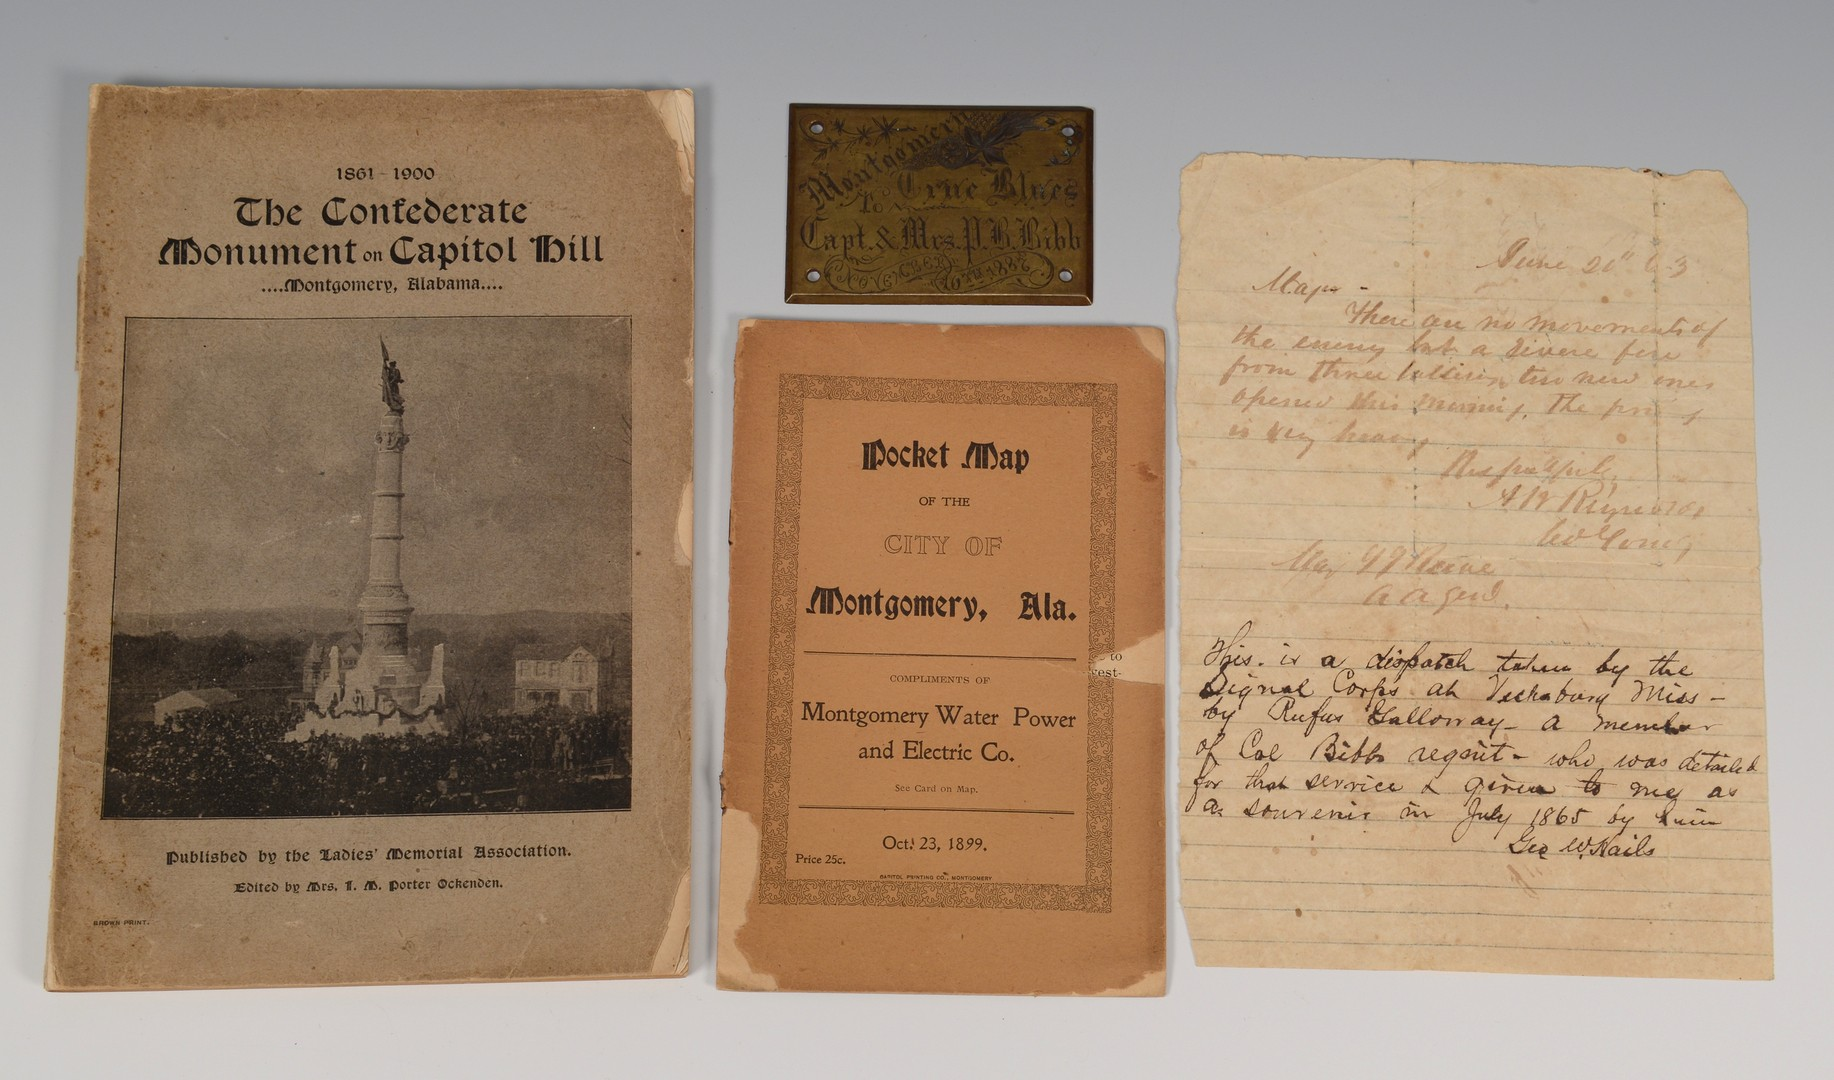 Lot 560: Bibb family archives & coverlet, Alabama